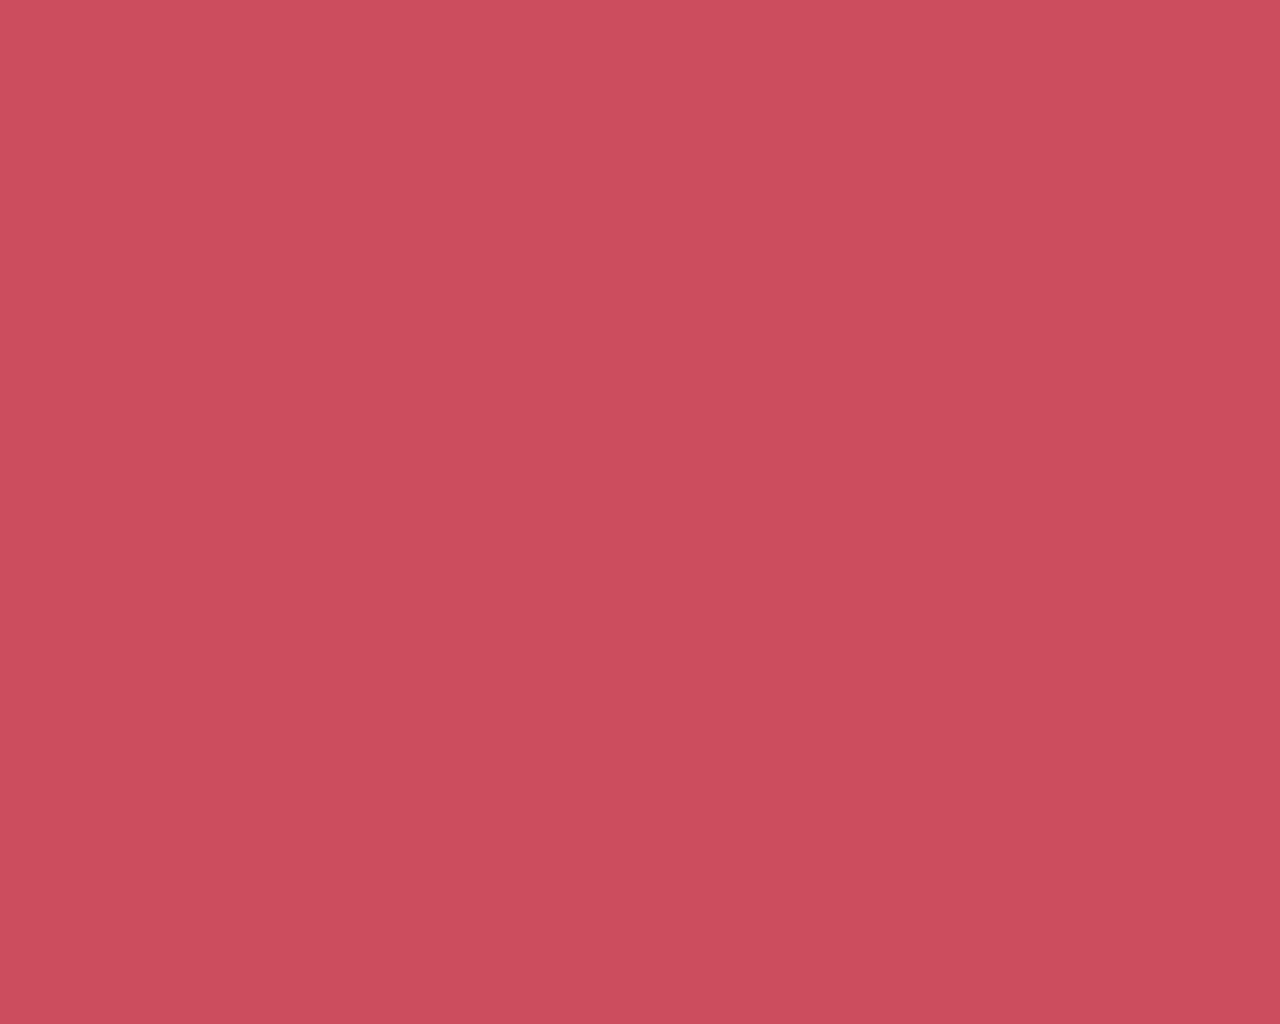 1280x1024 Dark Terra Cotta Solid Color Background